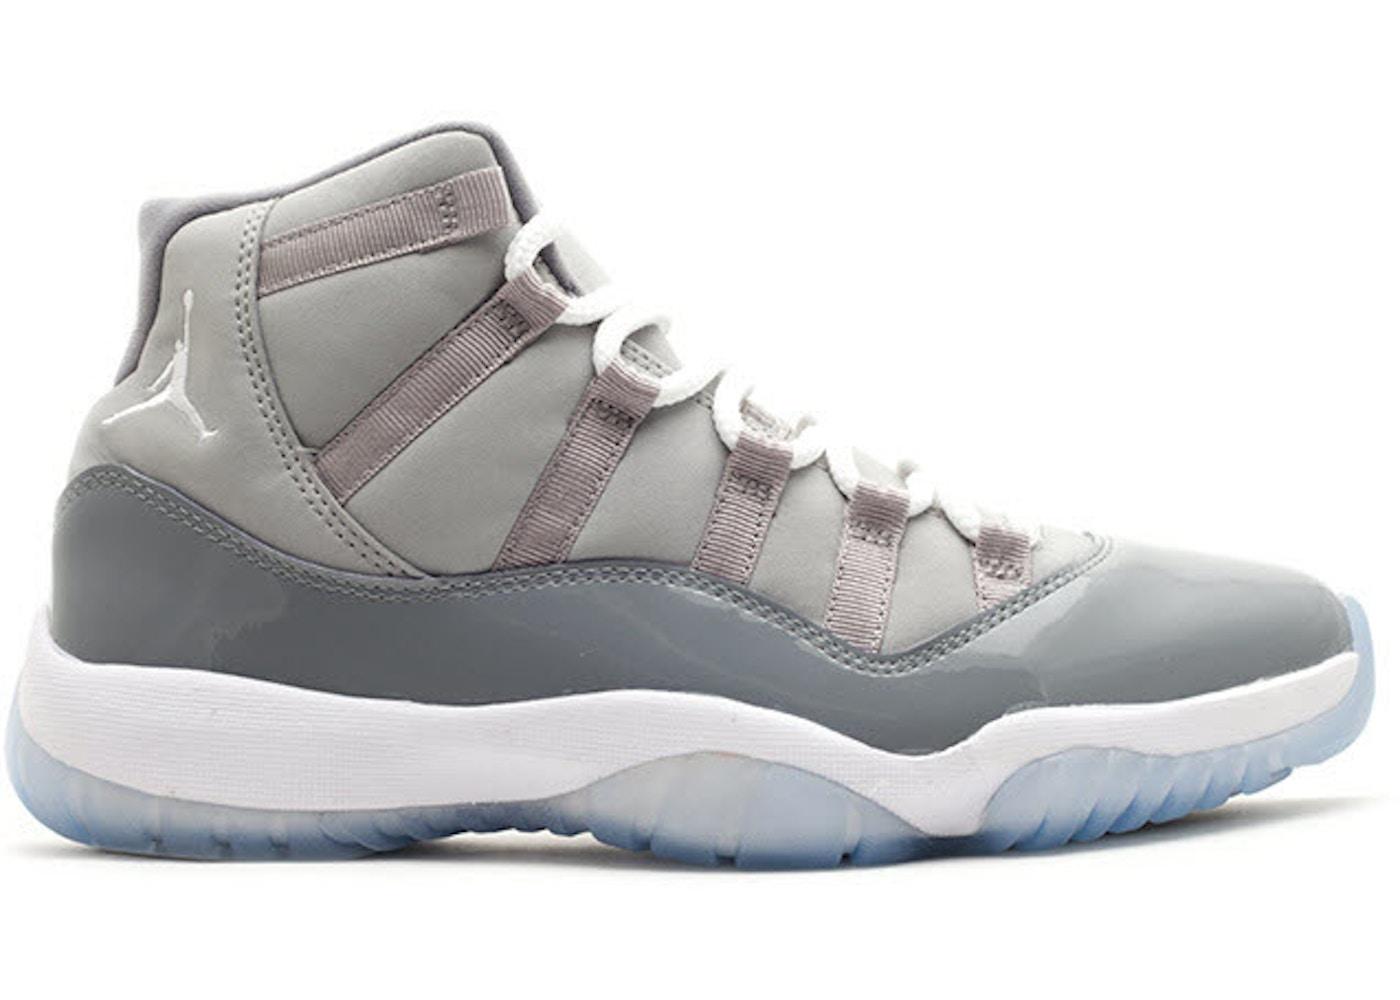 best sneakers 73199 3b574 retro 11 cool grey